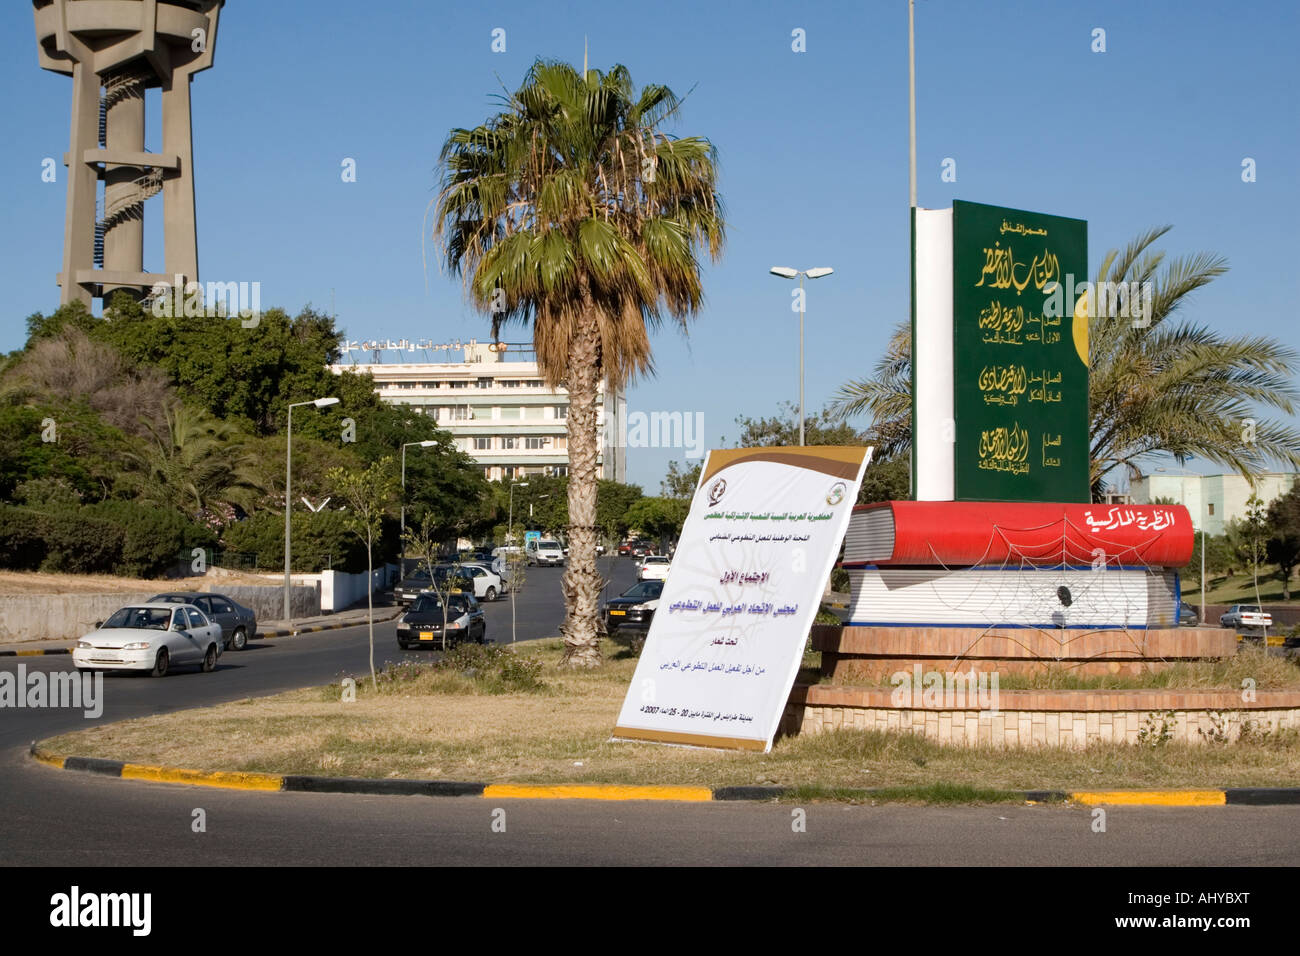 Tripoli, Libya.  Qadhafi Green Book Monument at Traffic Roundabout. - Stock Image